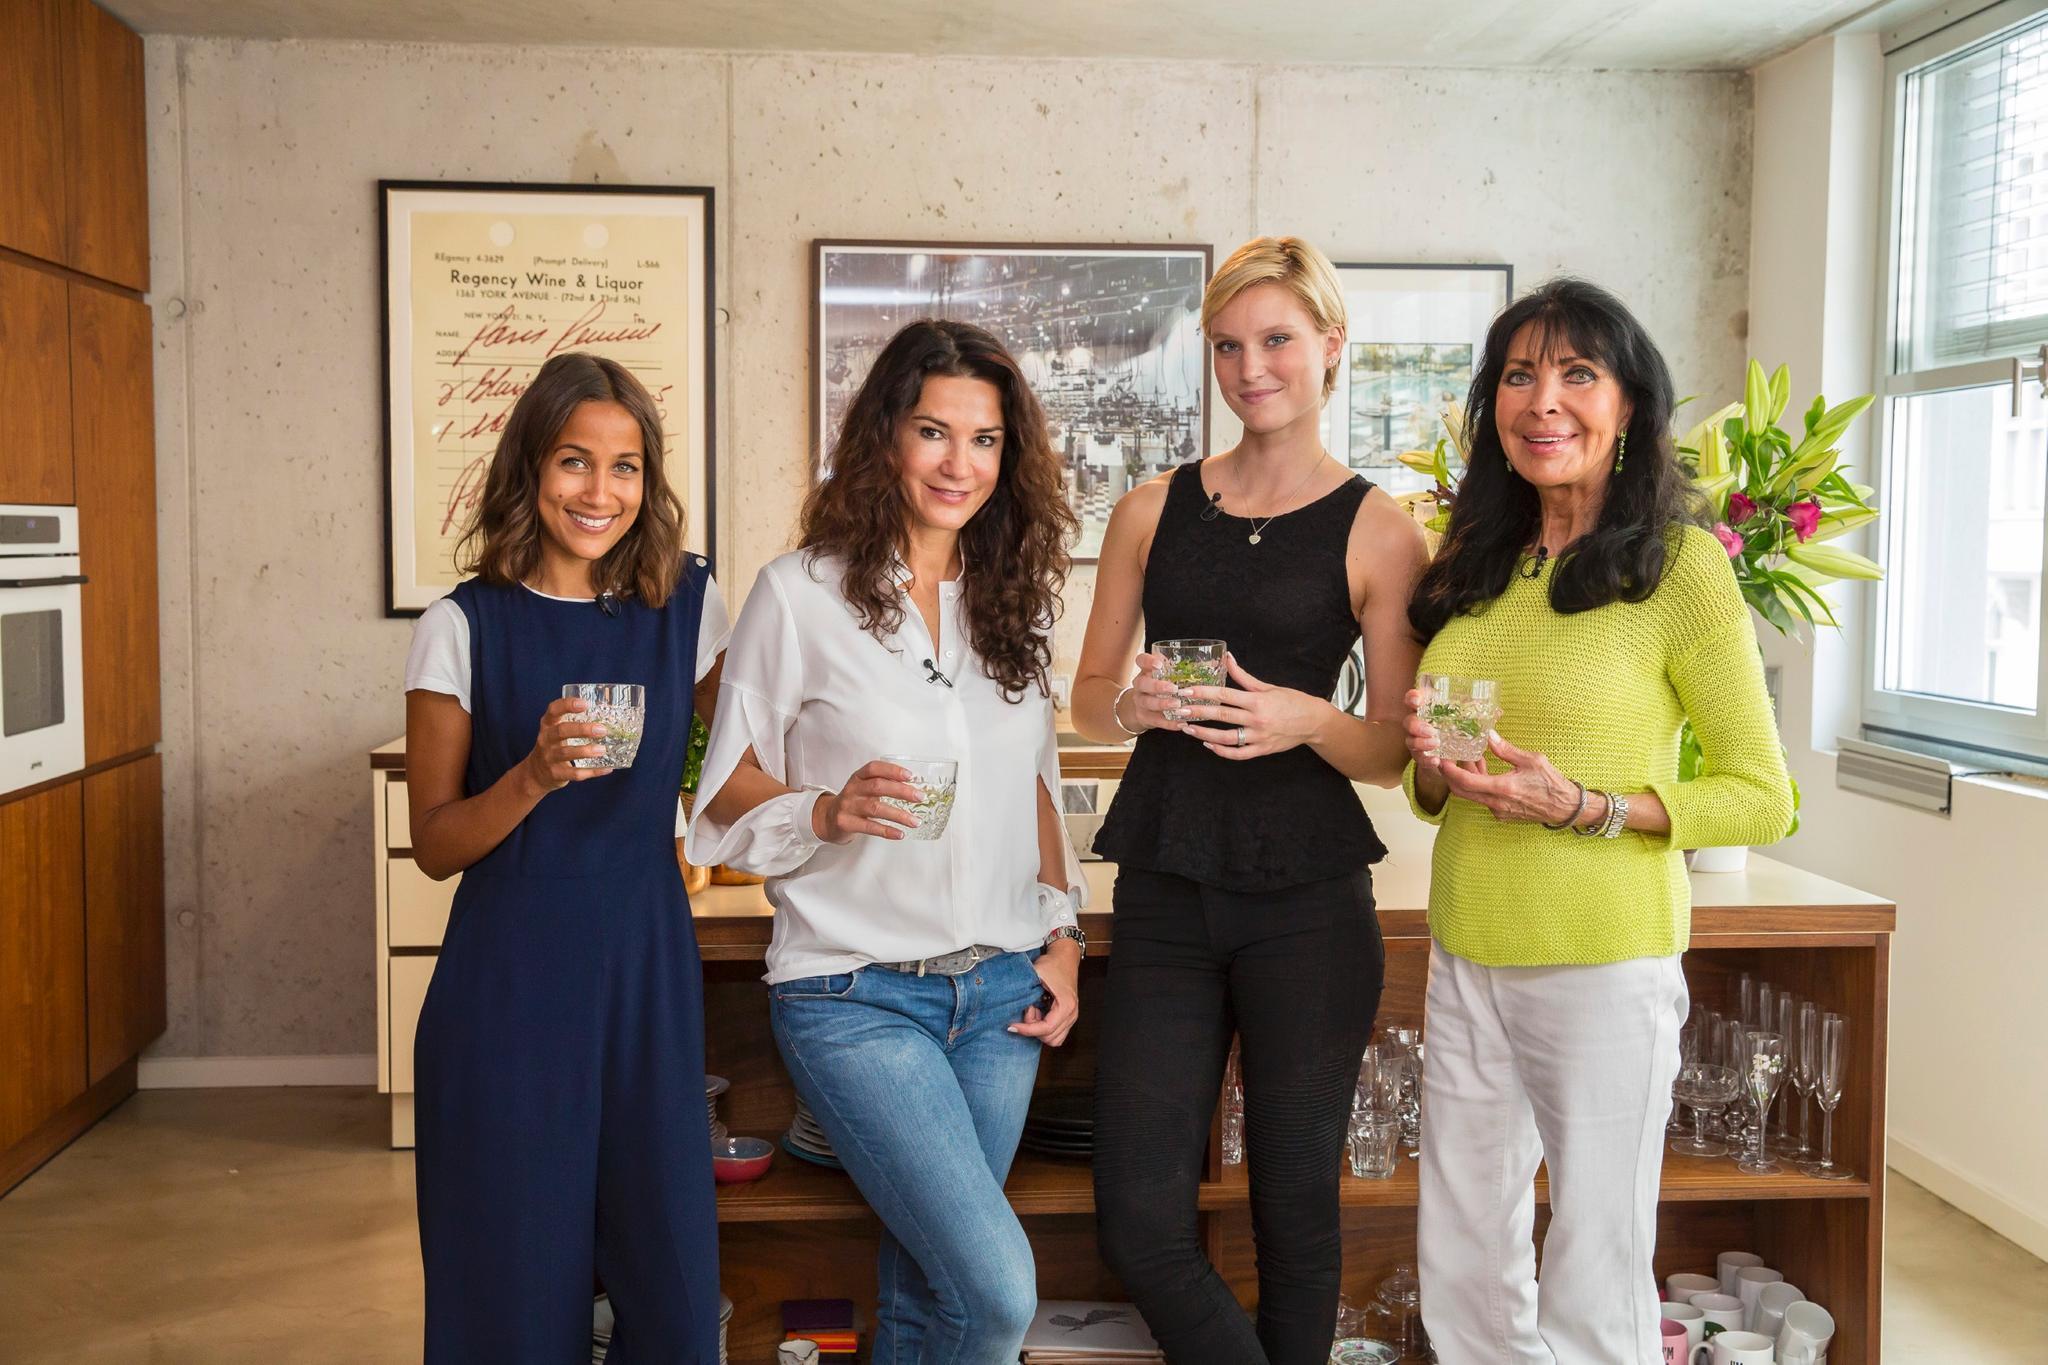 Rabea Schif, Mariella Ahrens, Kim Hnizdo + Dunja Rajter